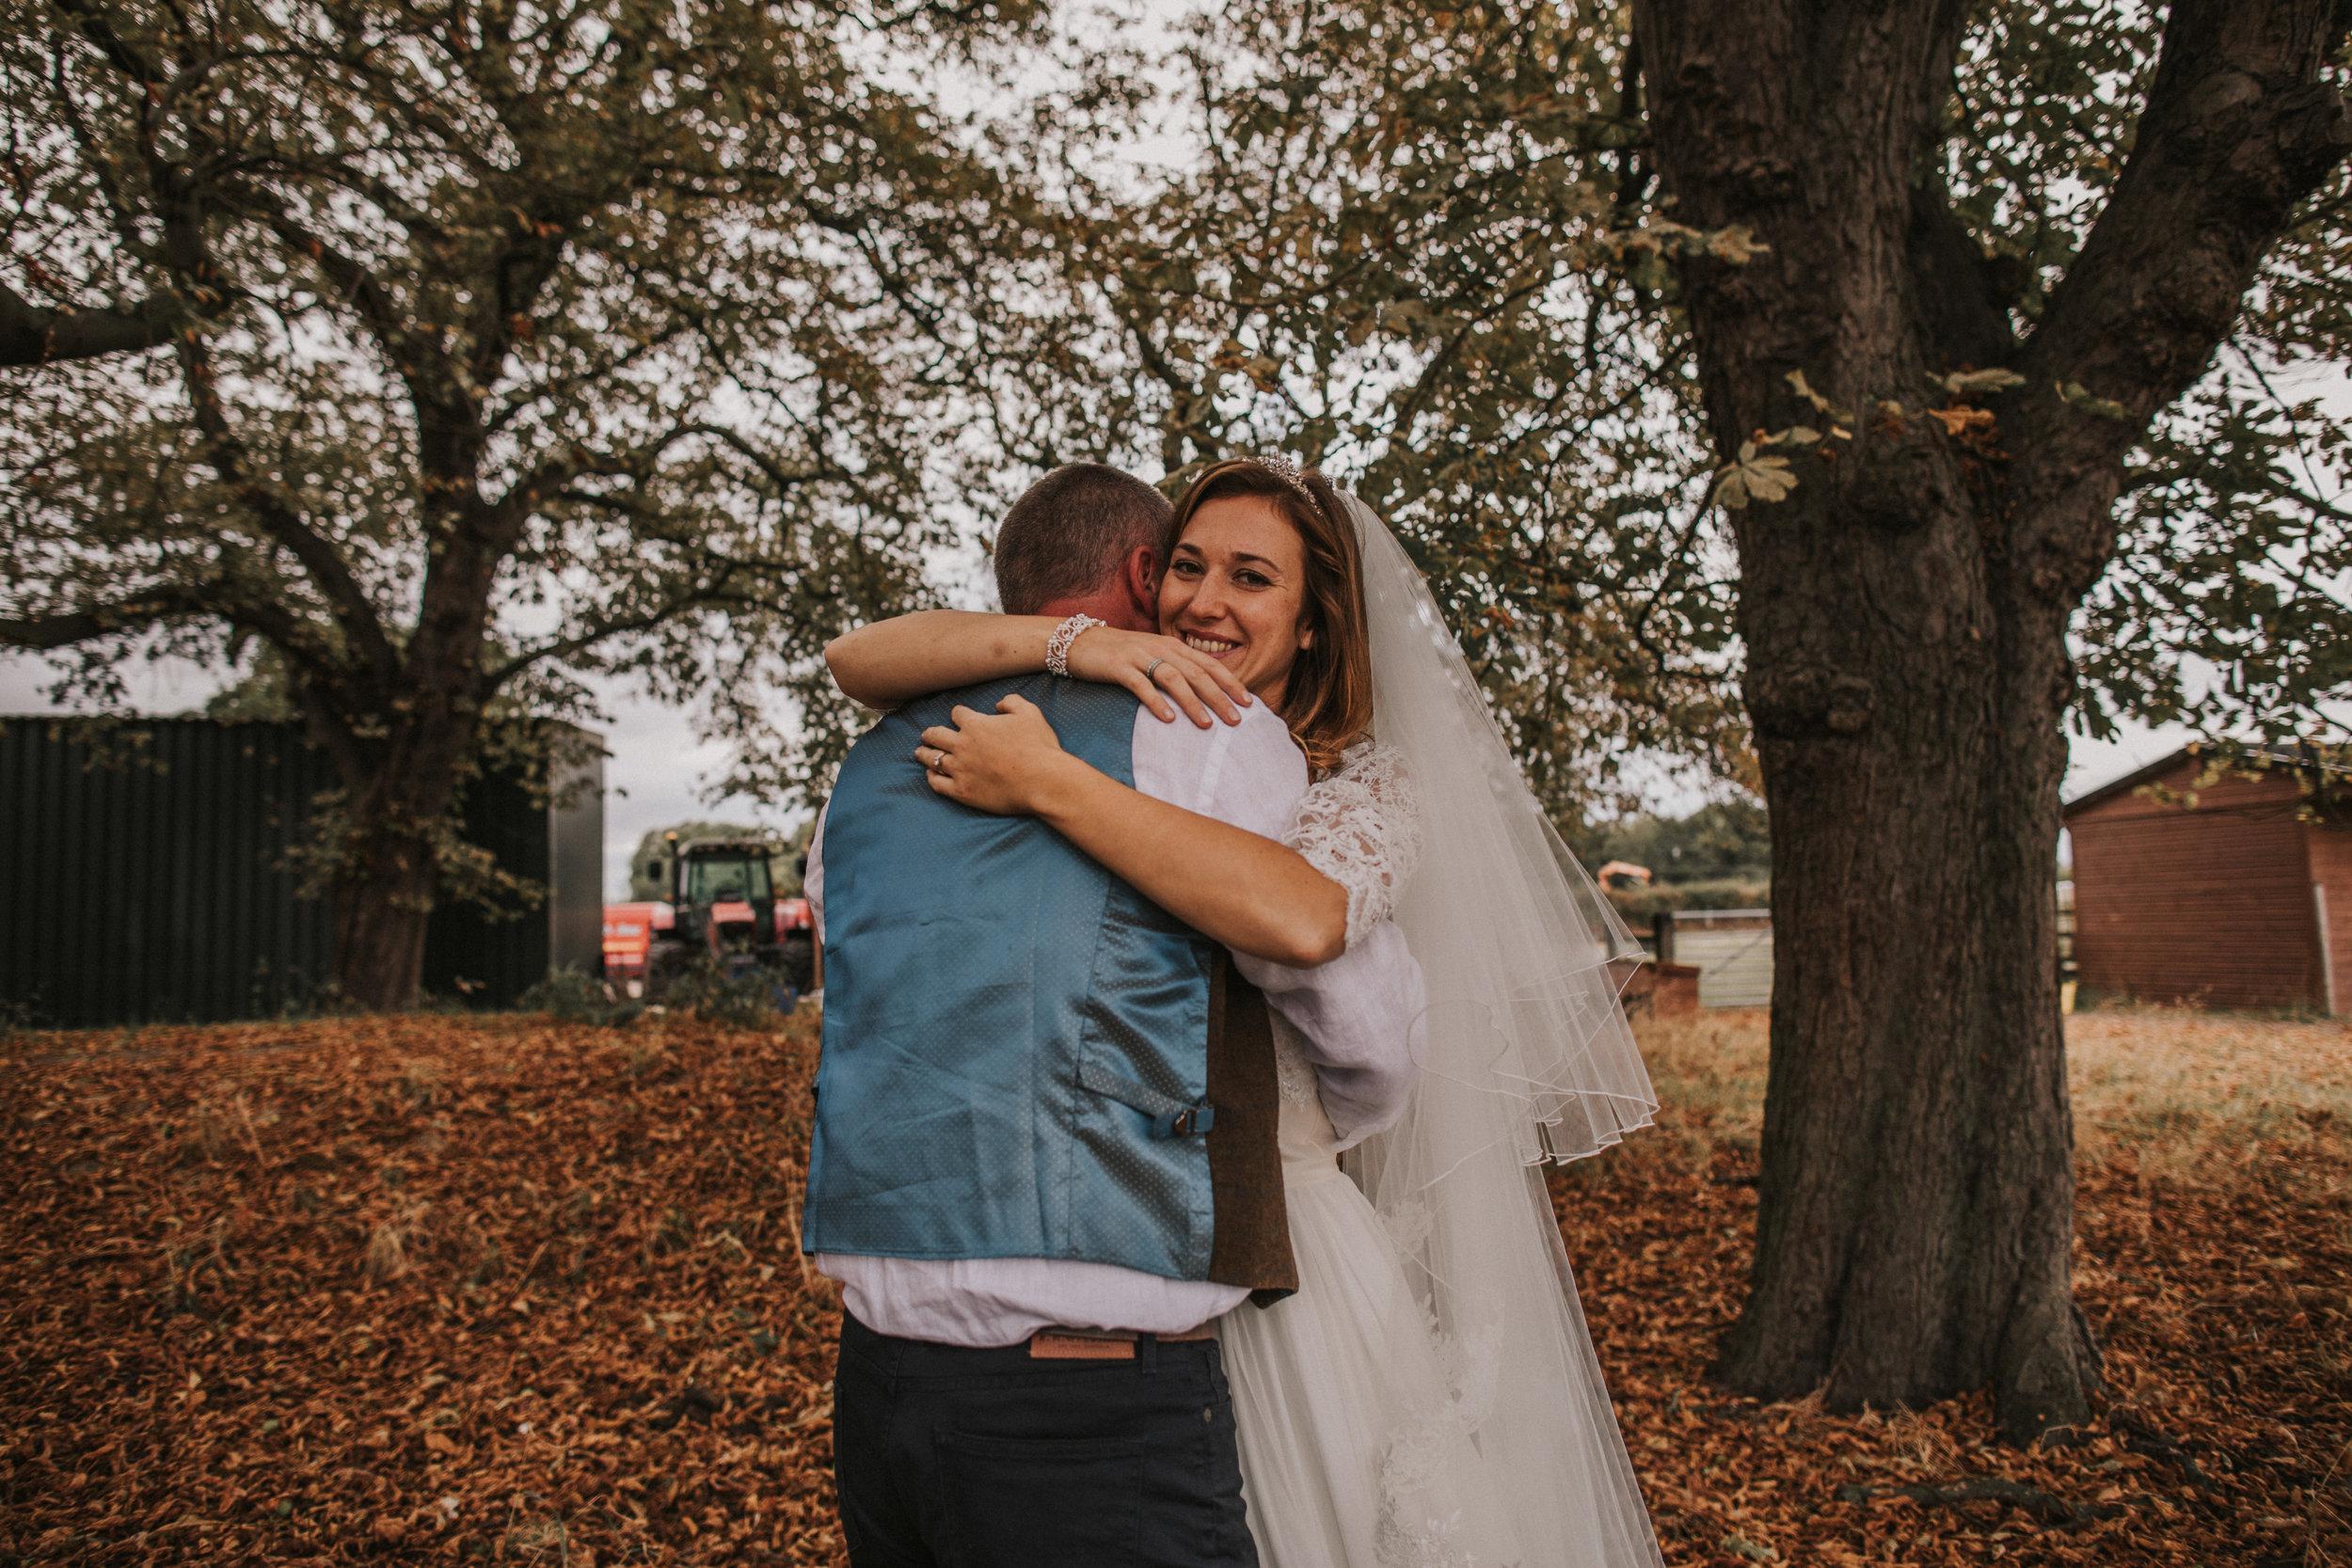 brook rose photography  Farm wedding_89.jpg